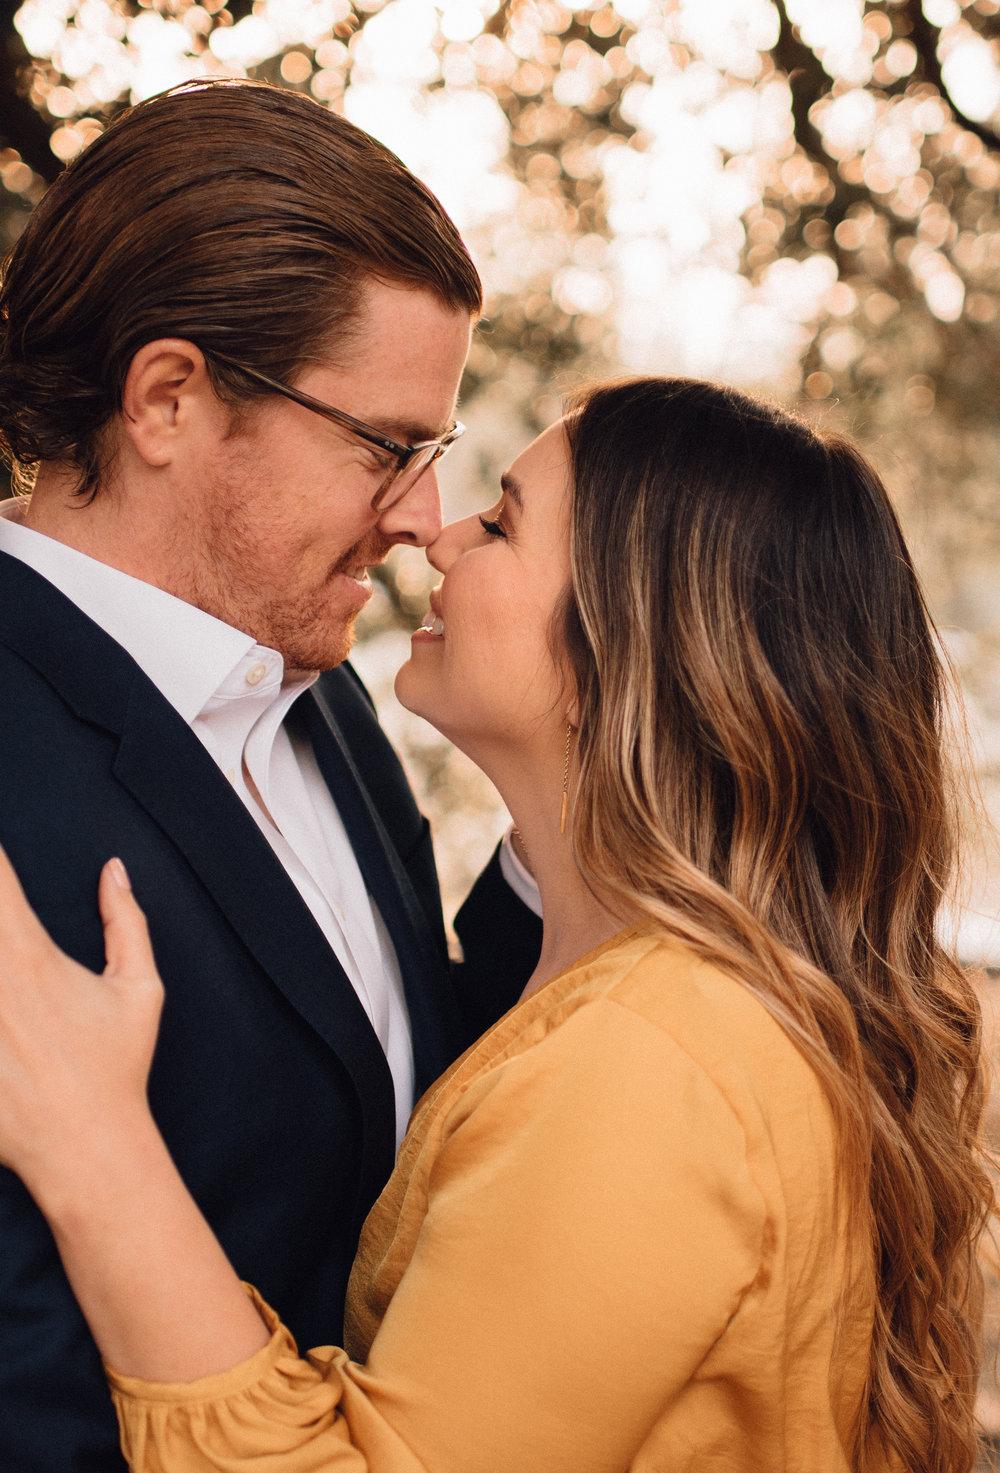 Southern-California-Wedding-Photography-Kalon-Weddings-123.jpg